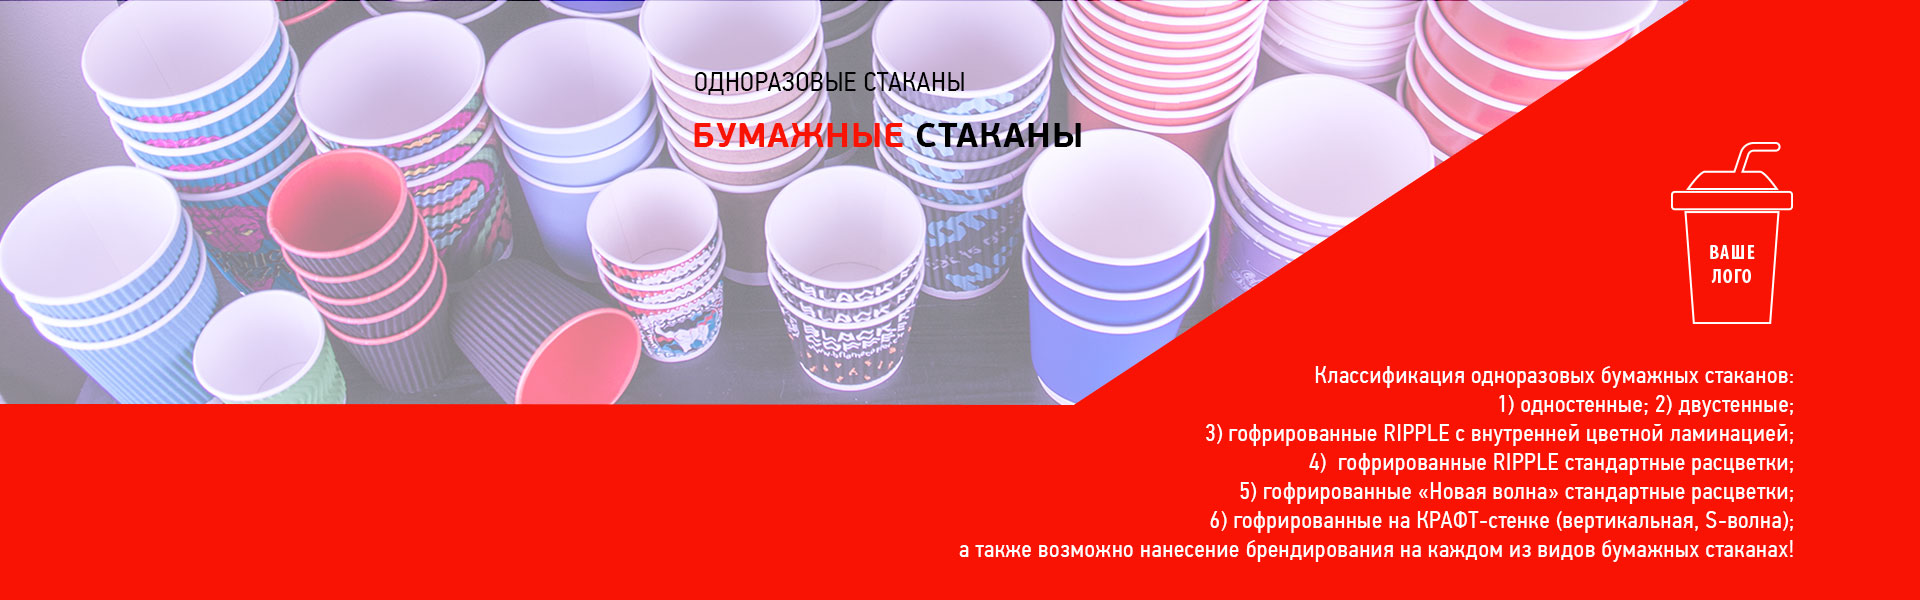 bumaznye_stakany_1920x600pix_310119_new_1